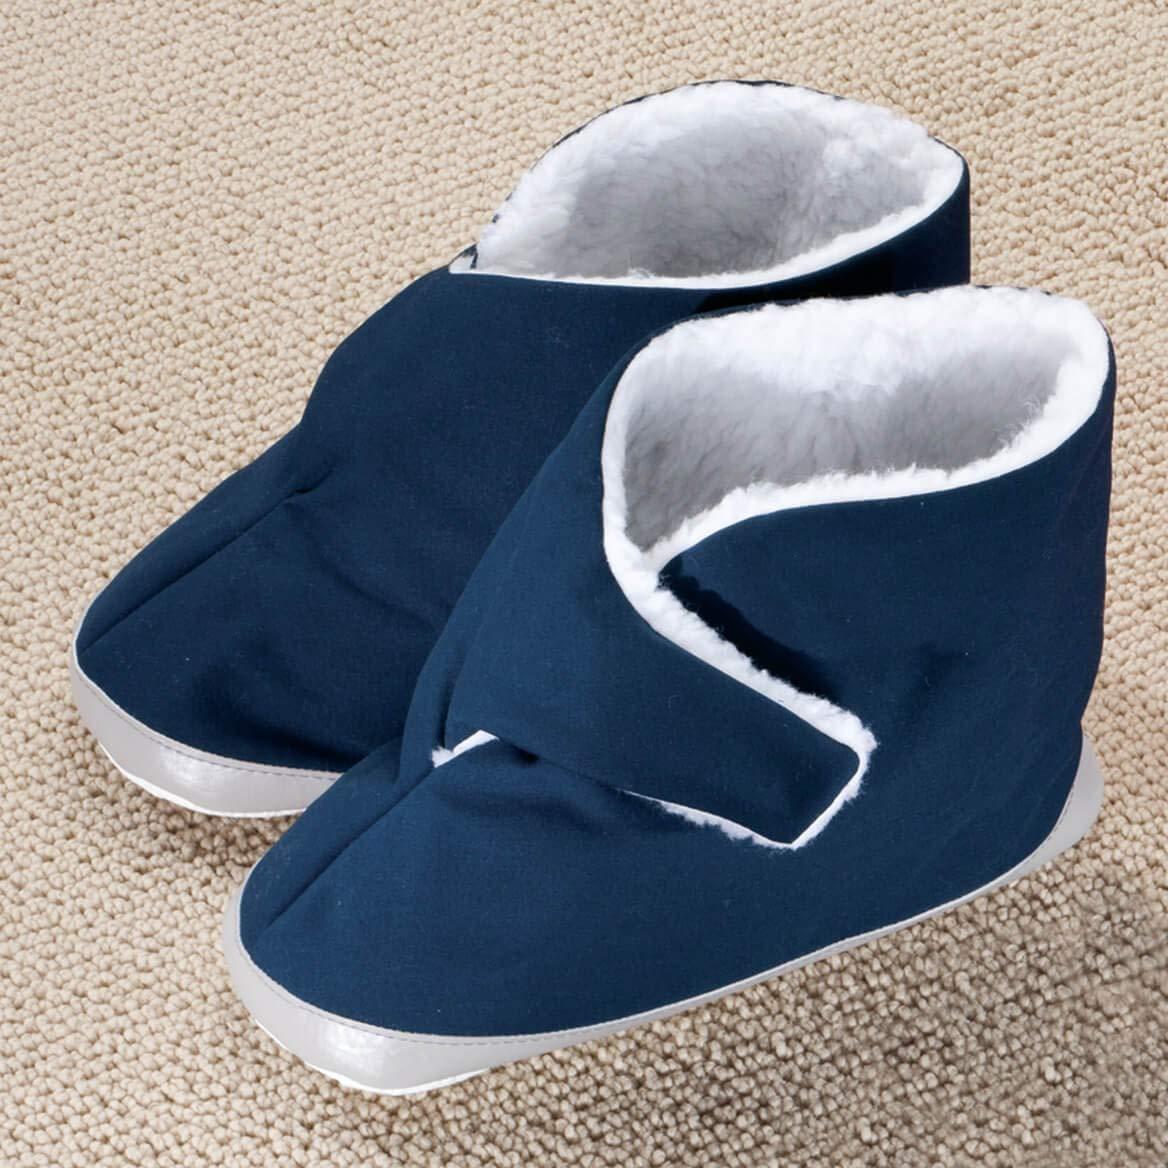 EasyComforts Mens Edema Slippers